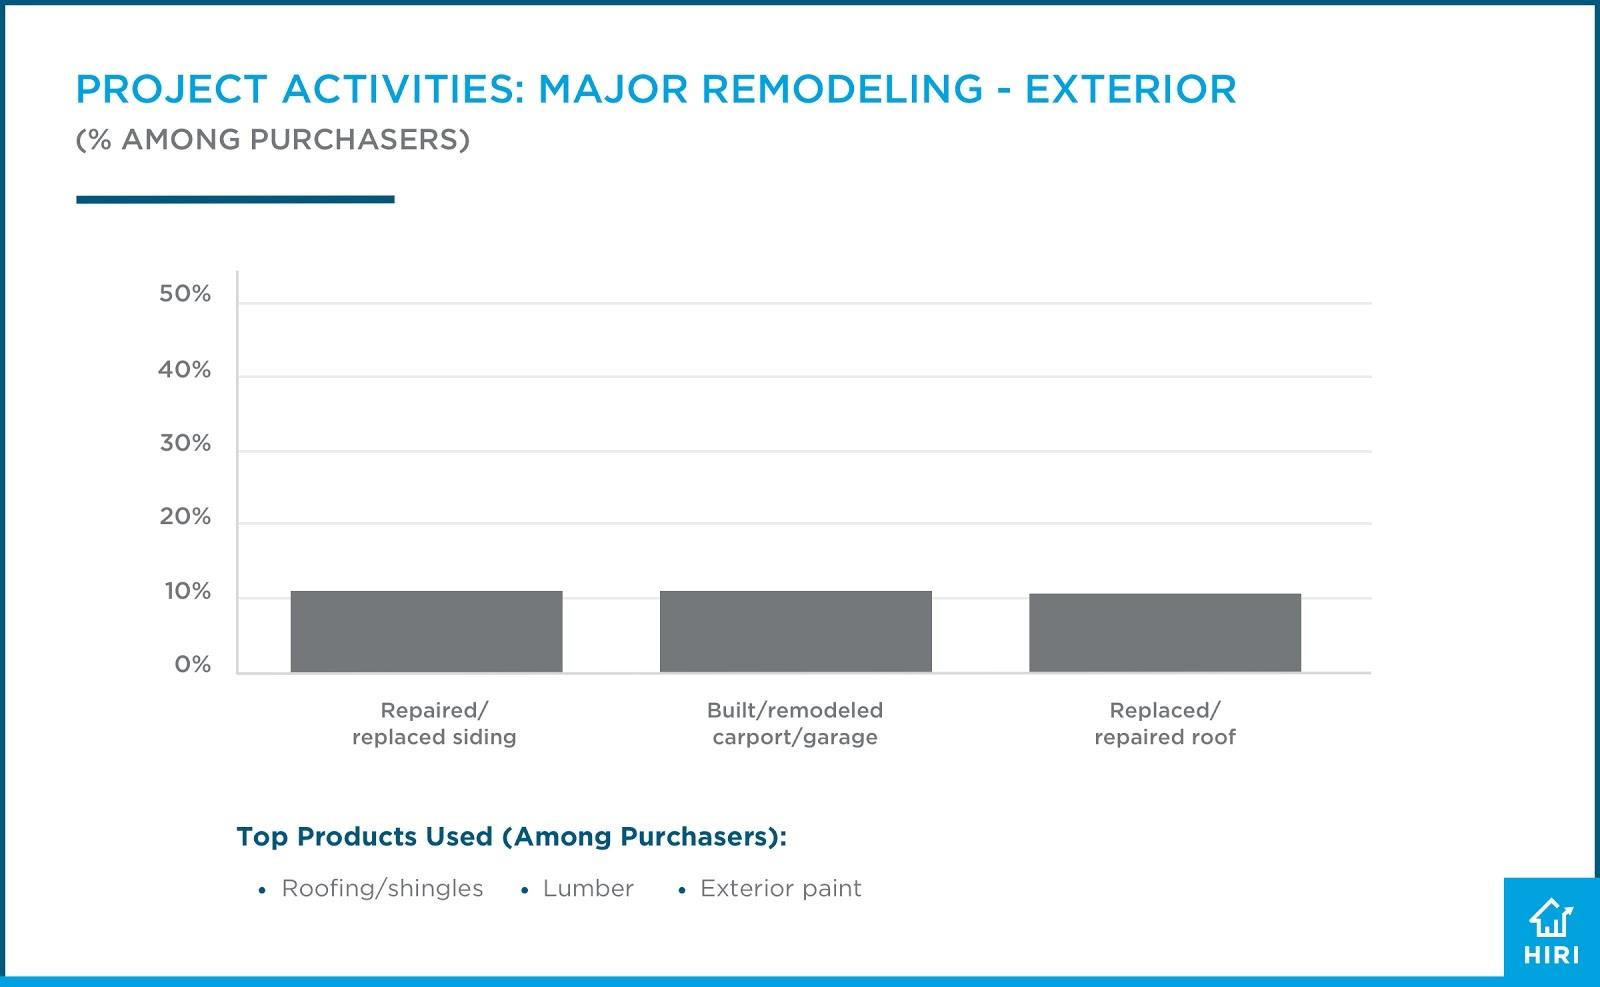 HIRI DIY Project Activites-Major Remodeling Exterior